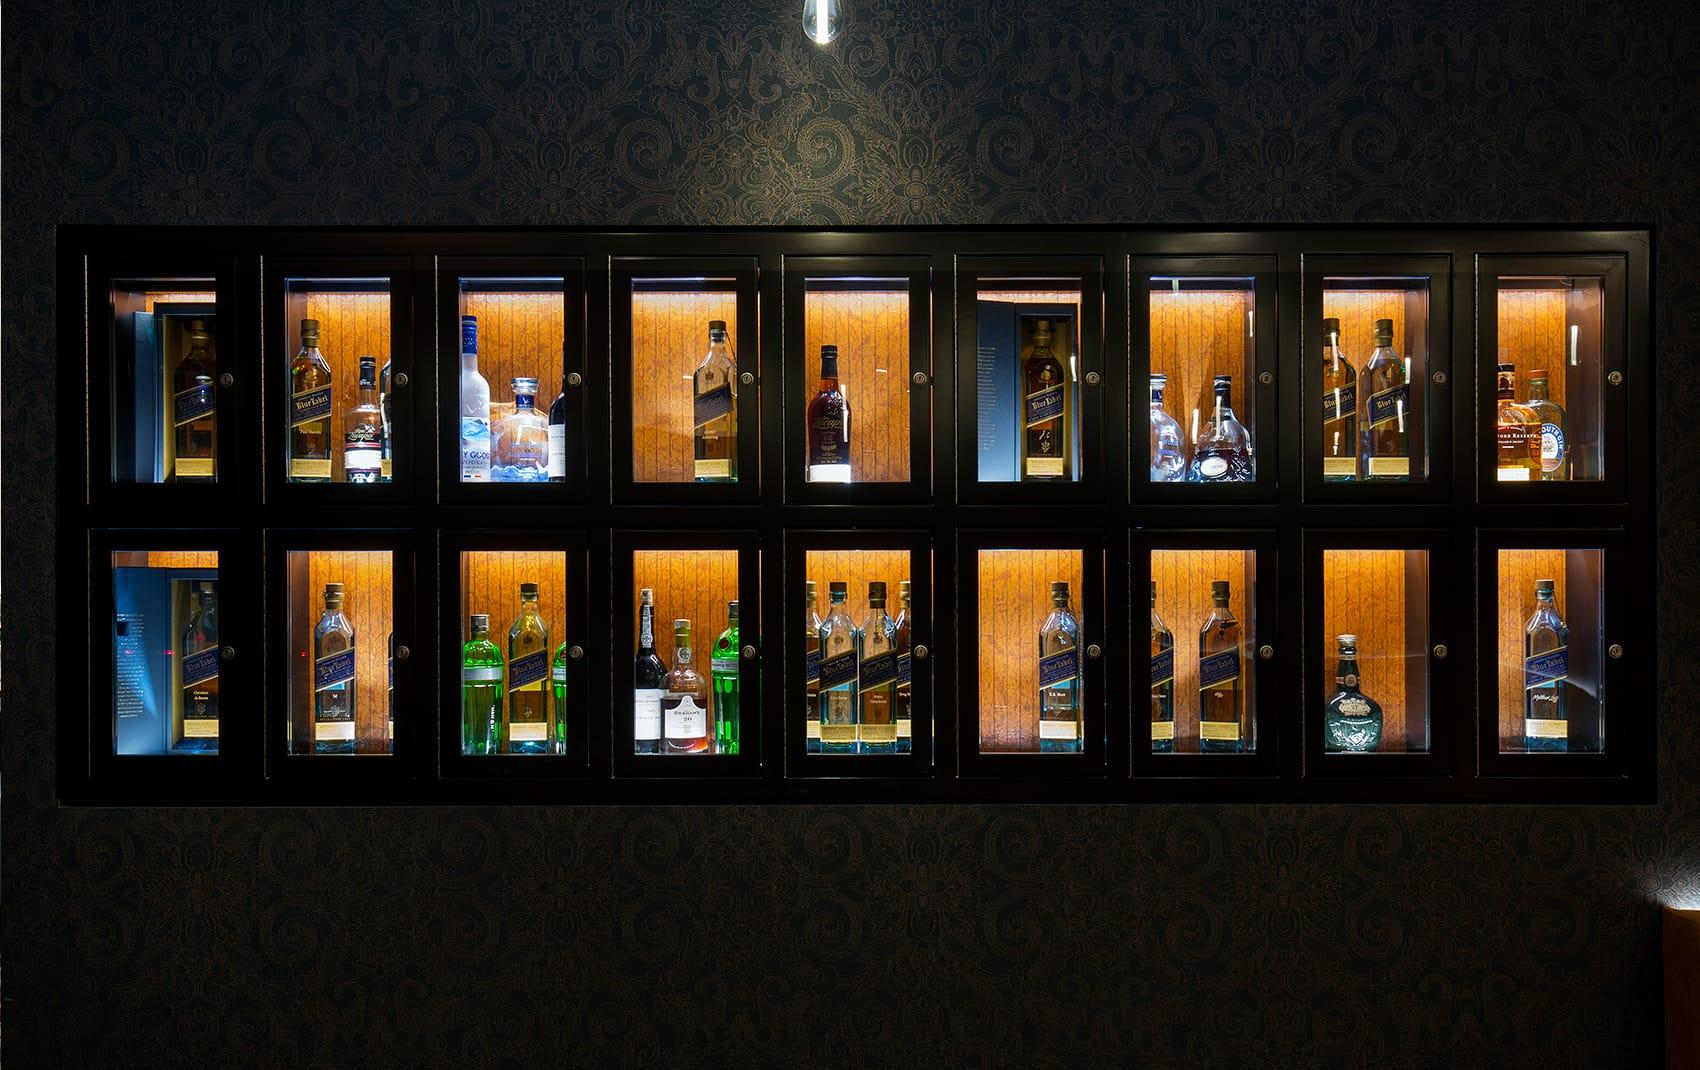 posh restaurants in london